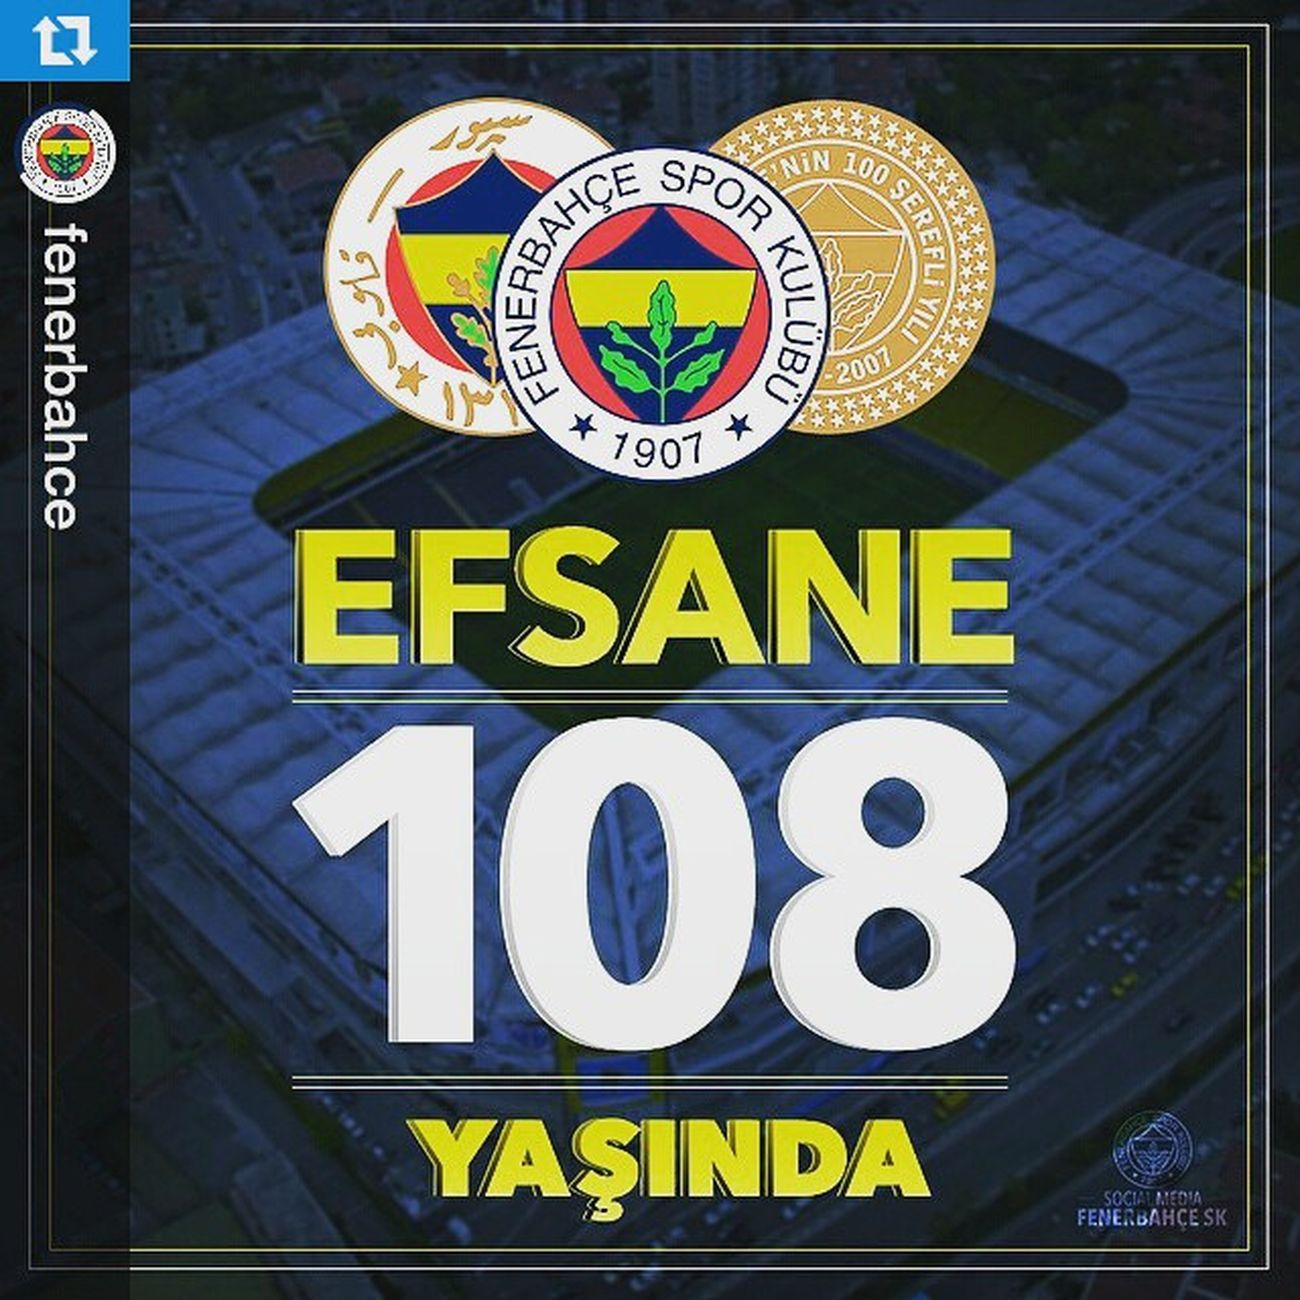 Repost @fenerbahce ・・・ FENERBAHÇEMİZ 108 YAŞINDA! Fenerbahce  InstaFB